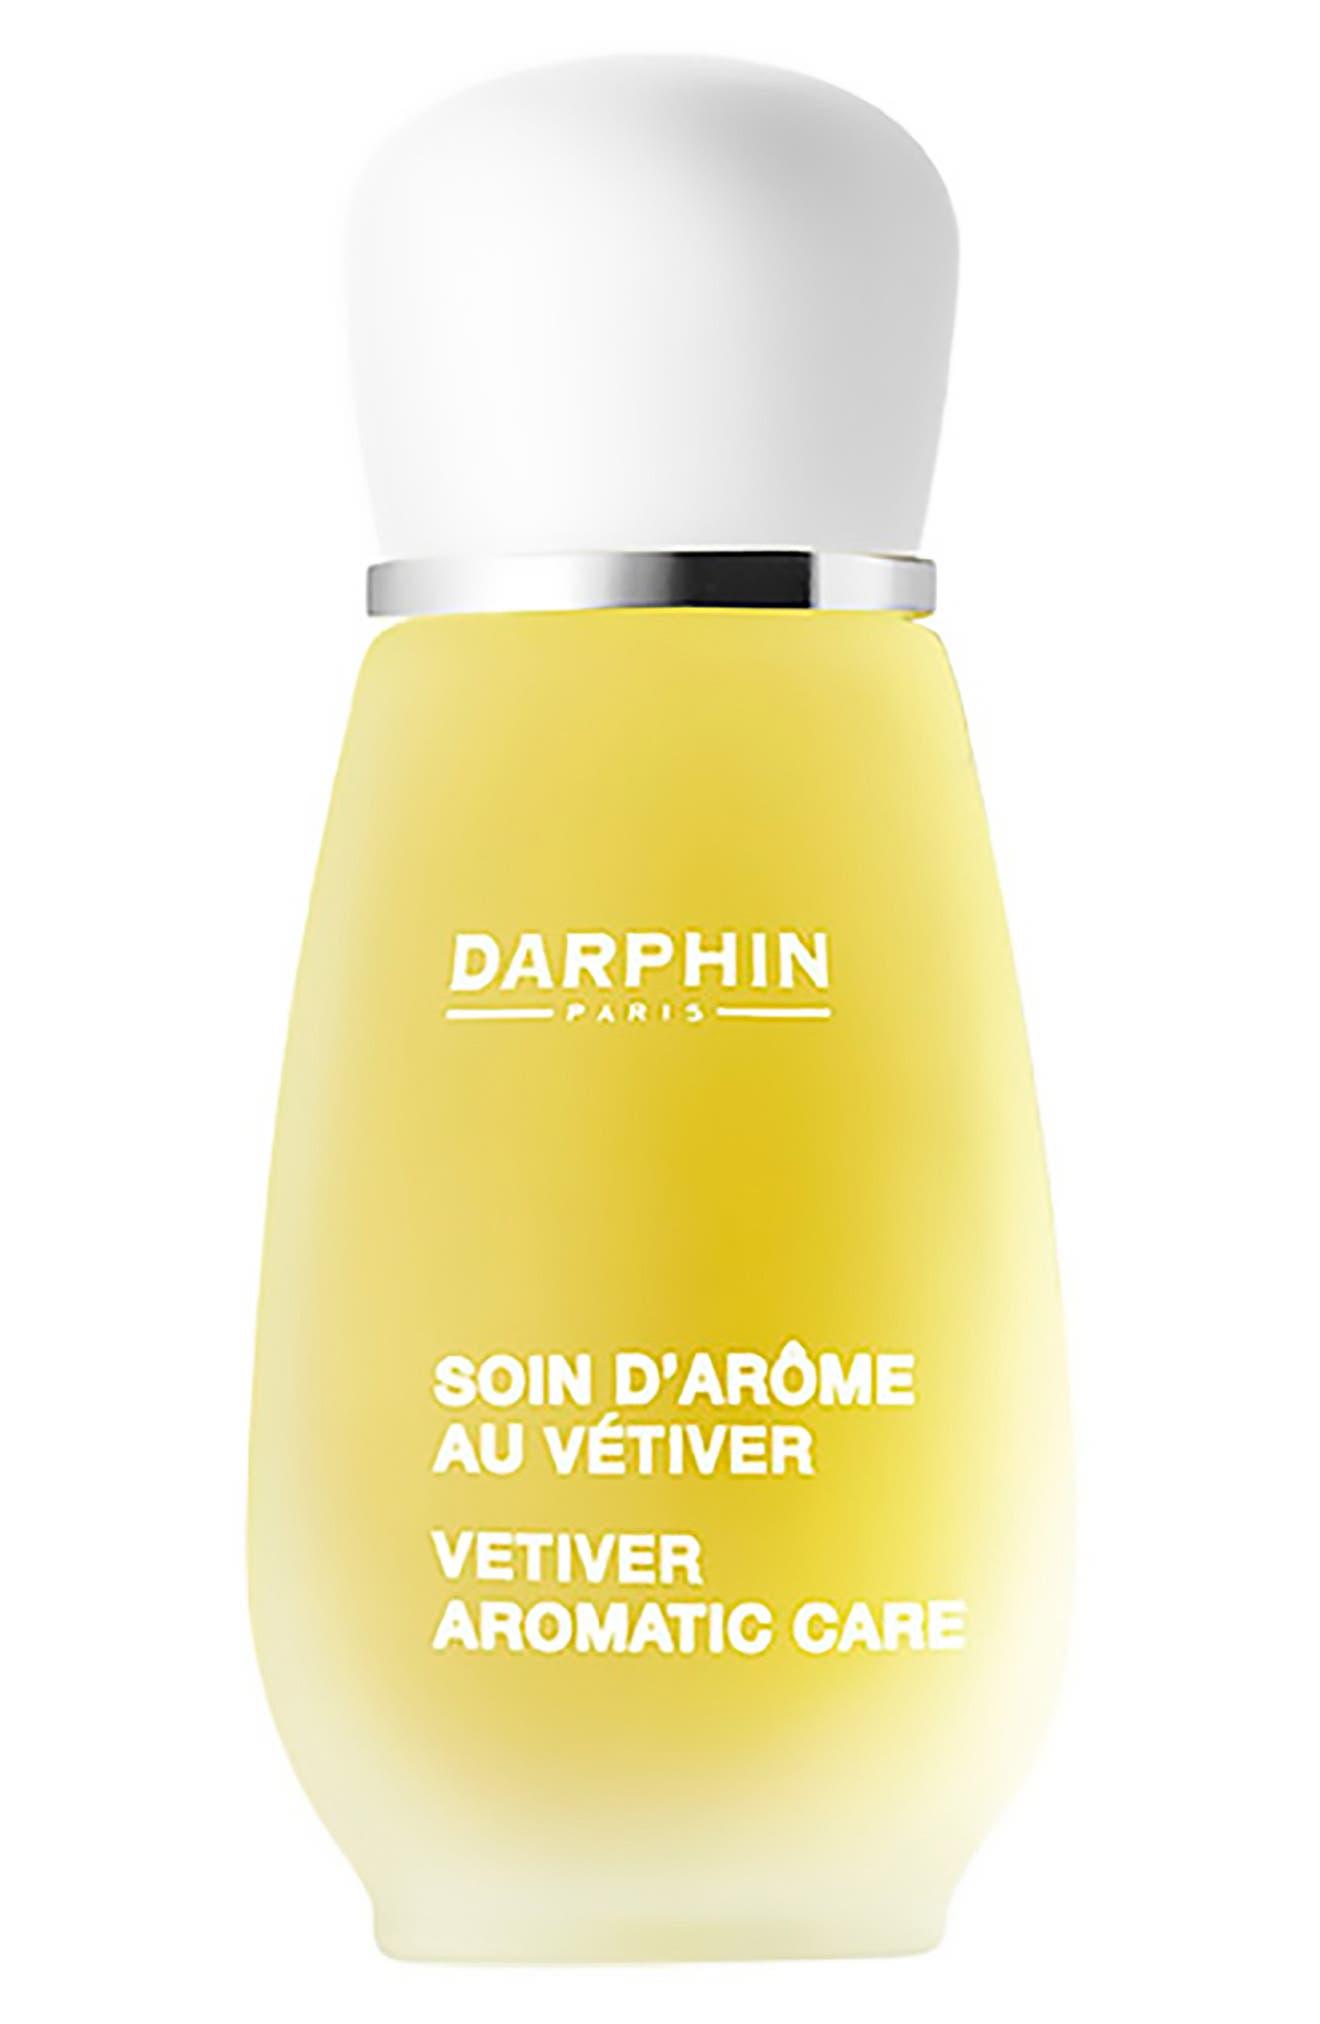 Vetiver Aromatic Care